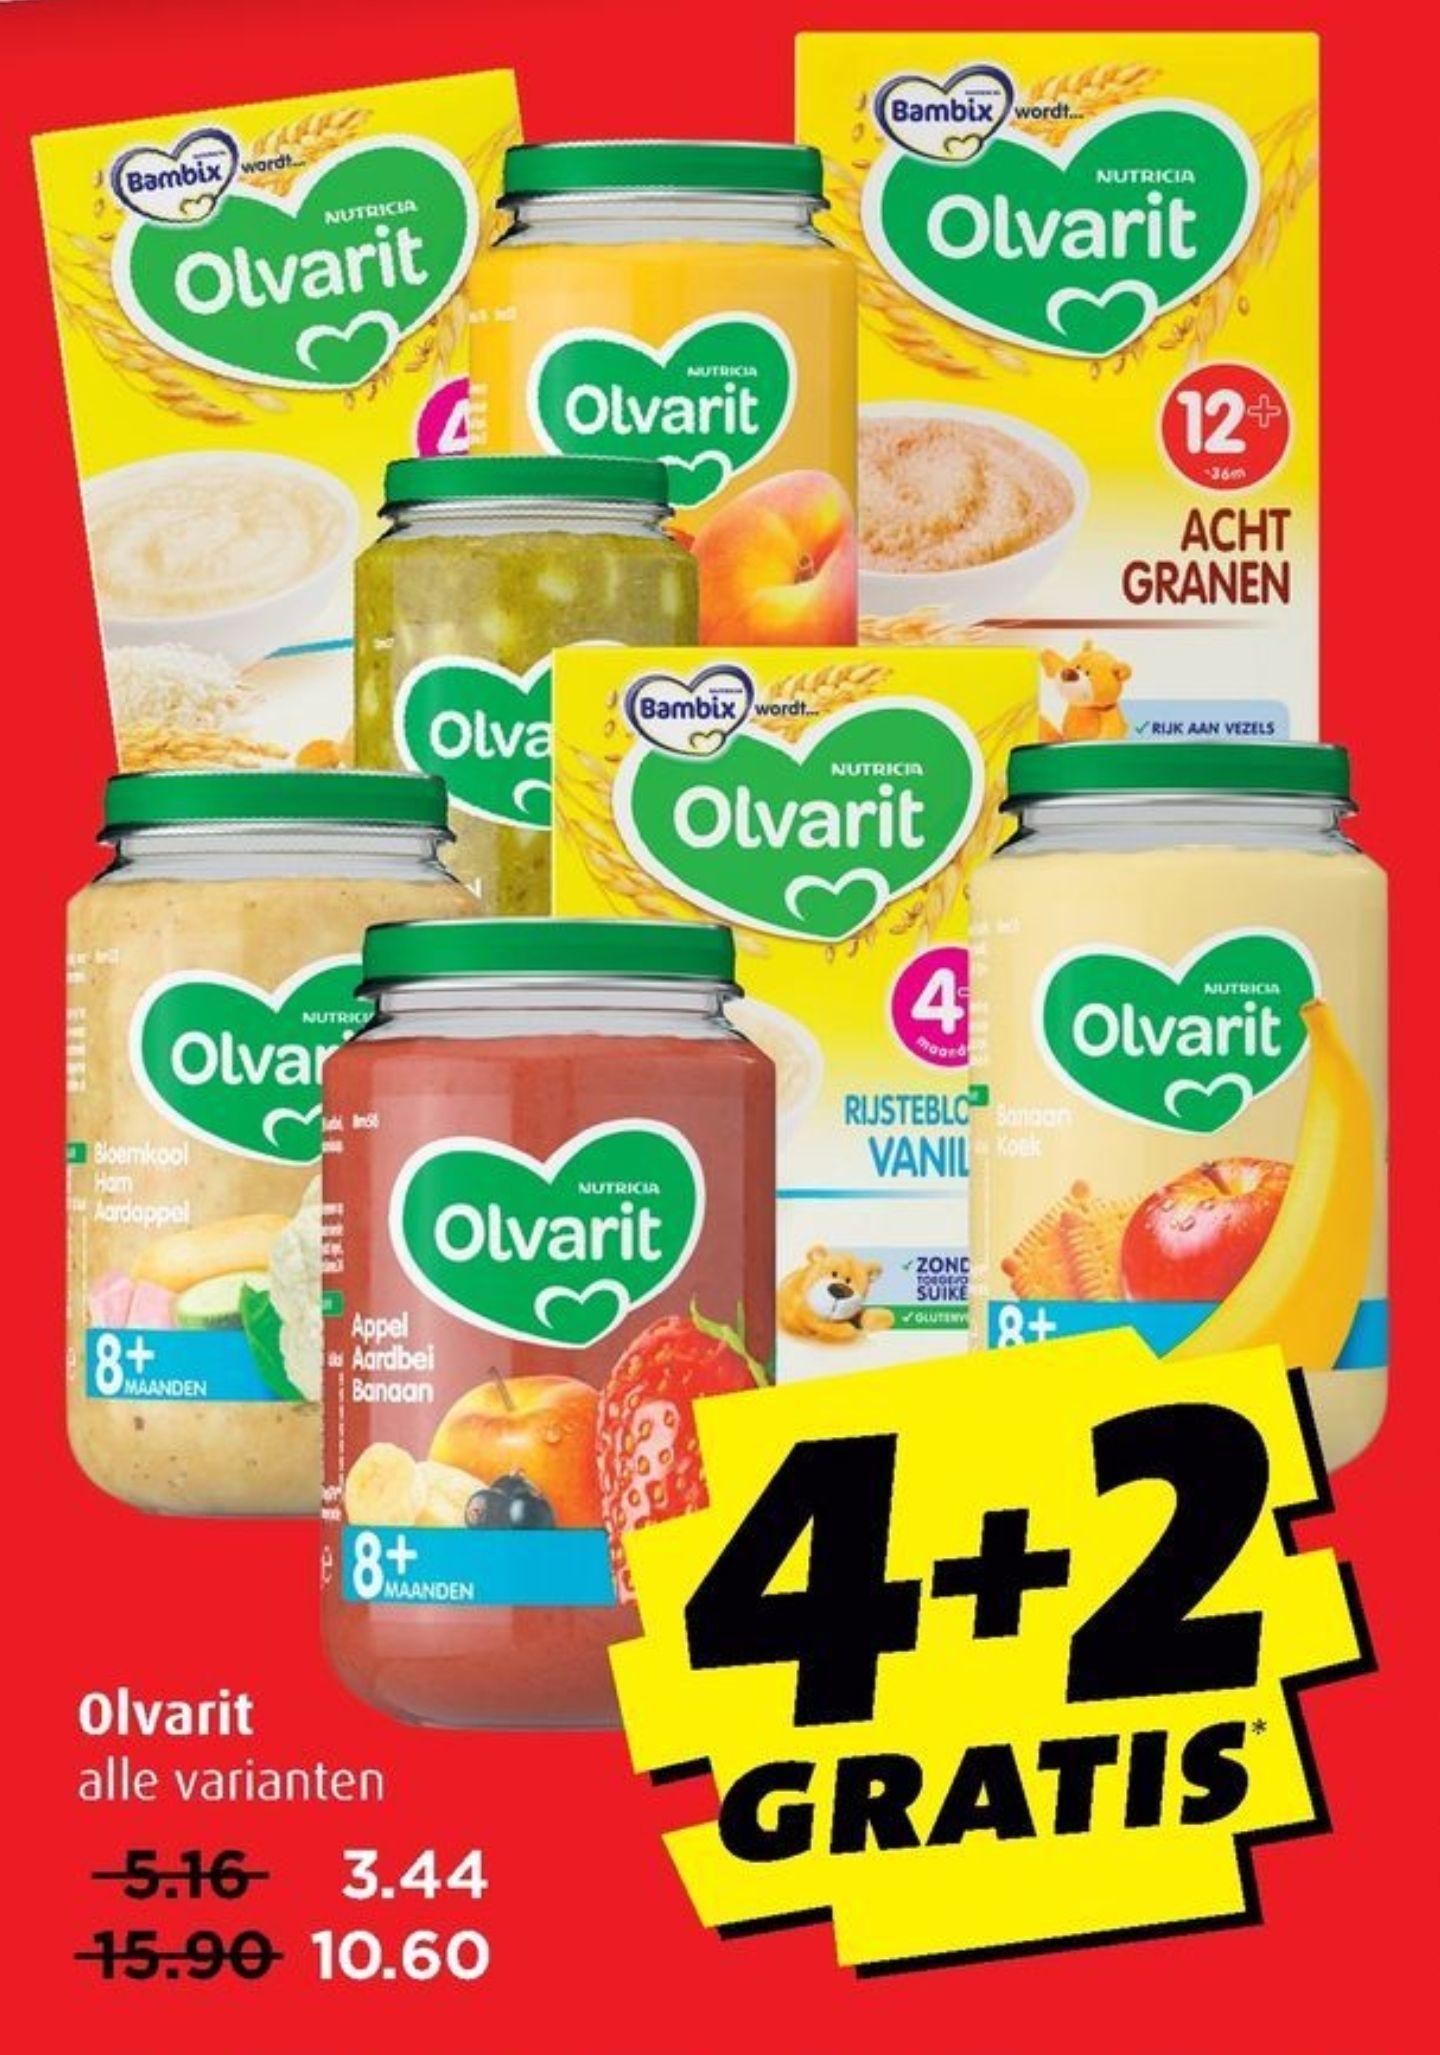 Alle Olvarit 4 + 2 gratis @Boni/Hoogvliet/Vomar